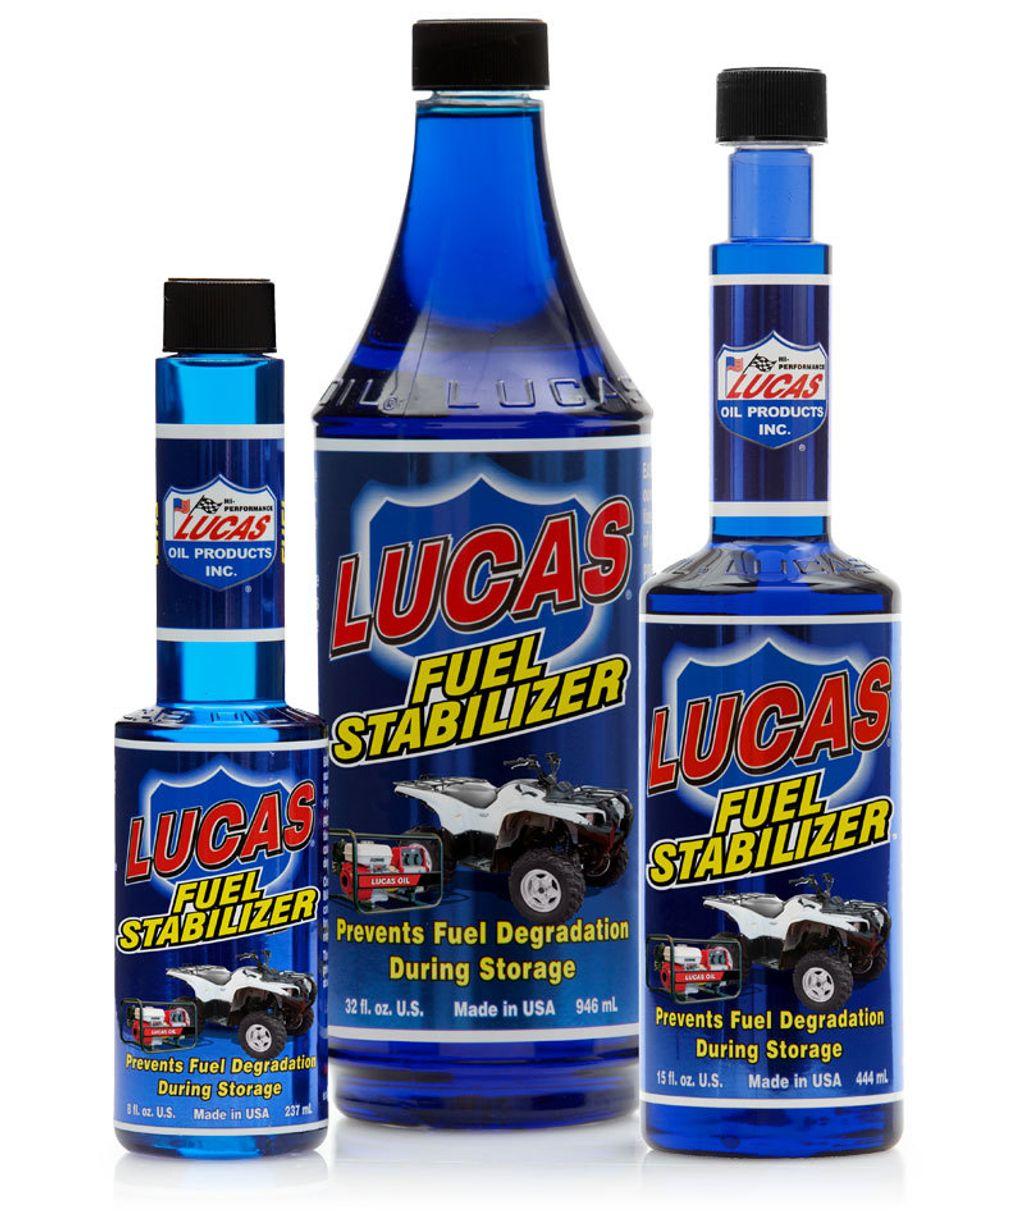 lucas fuel stabilizer3.jpg